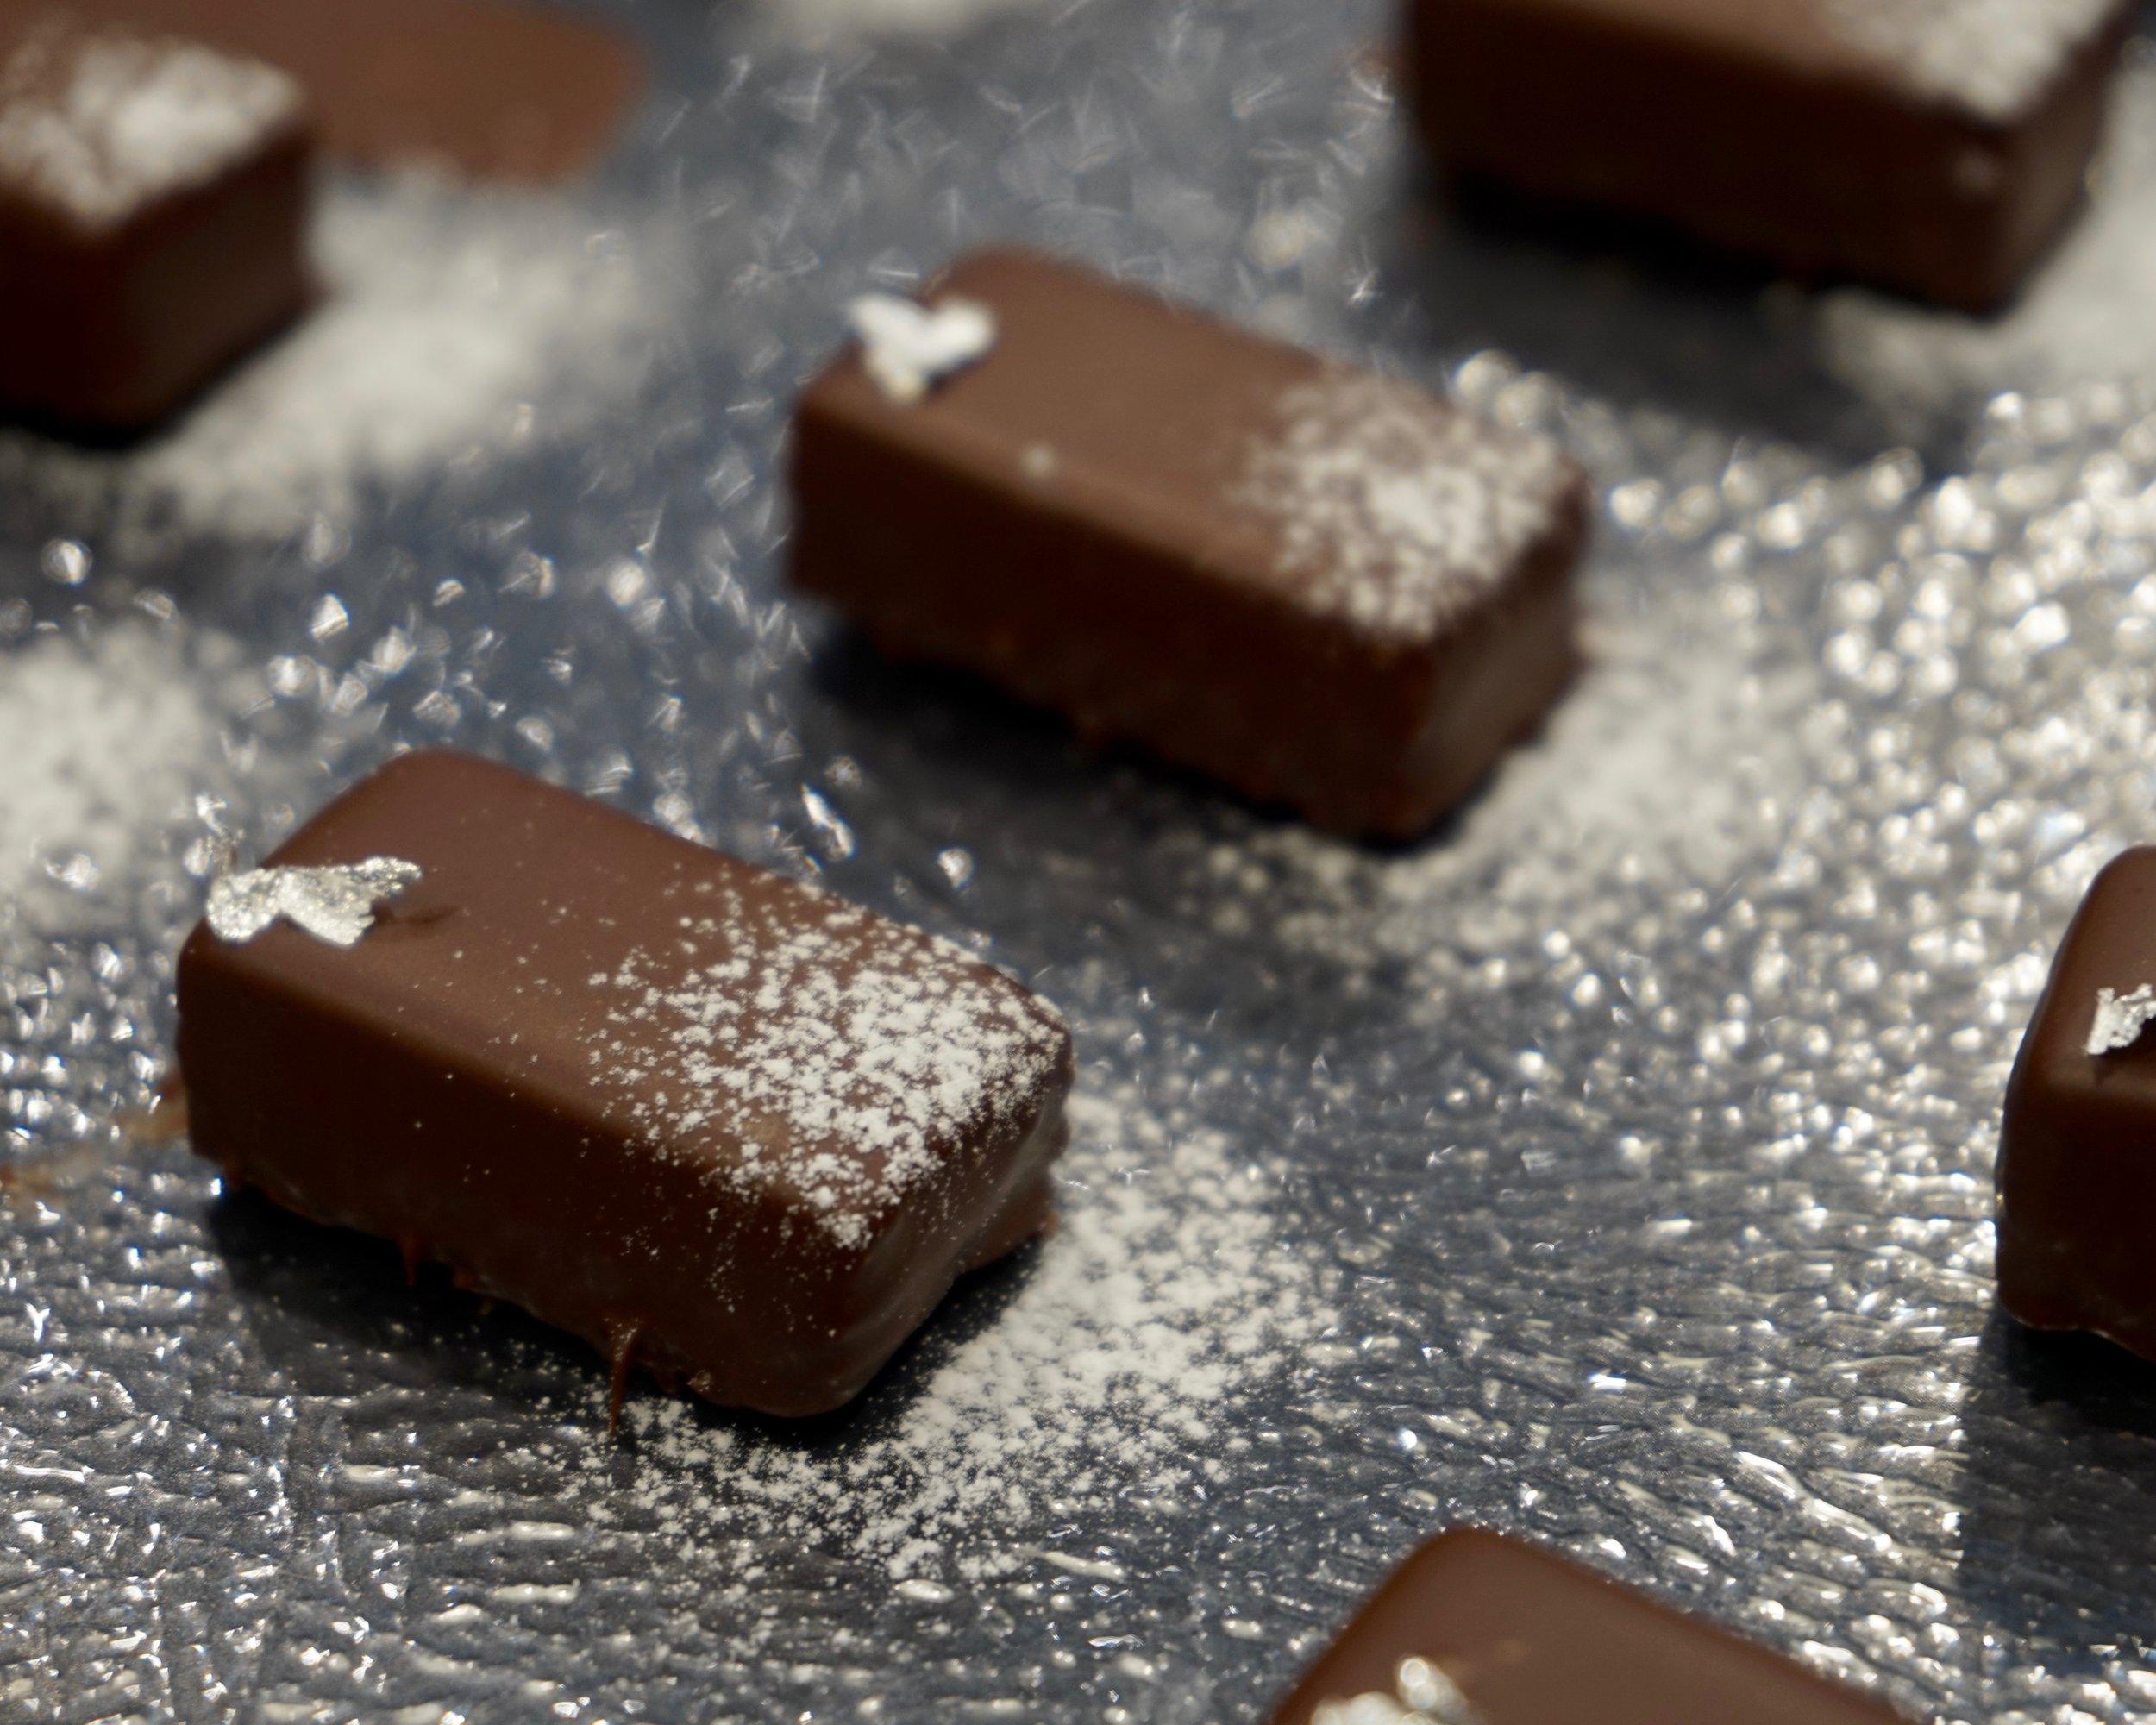 Chocolate bonbons with sake kasu made by Gusta Cooking Studio